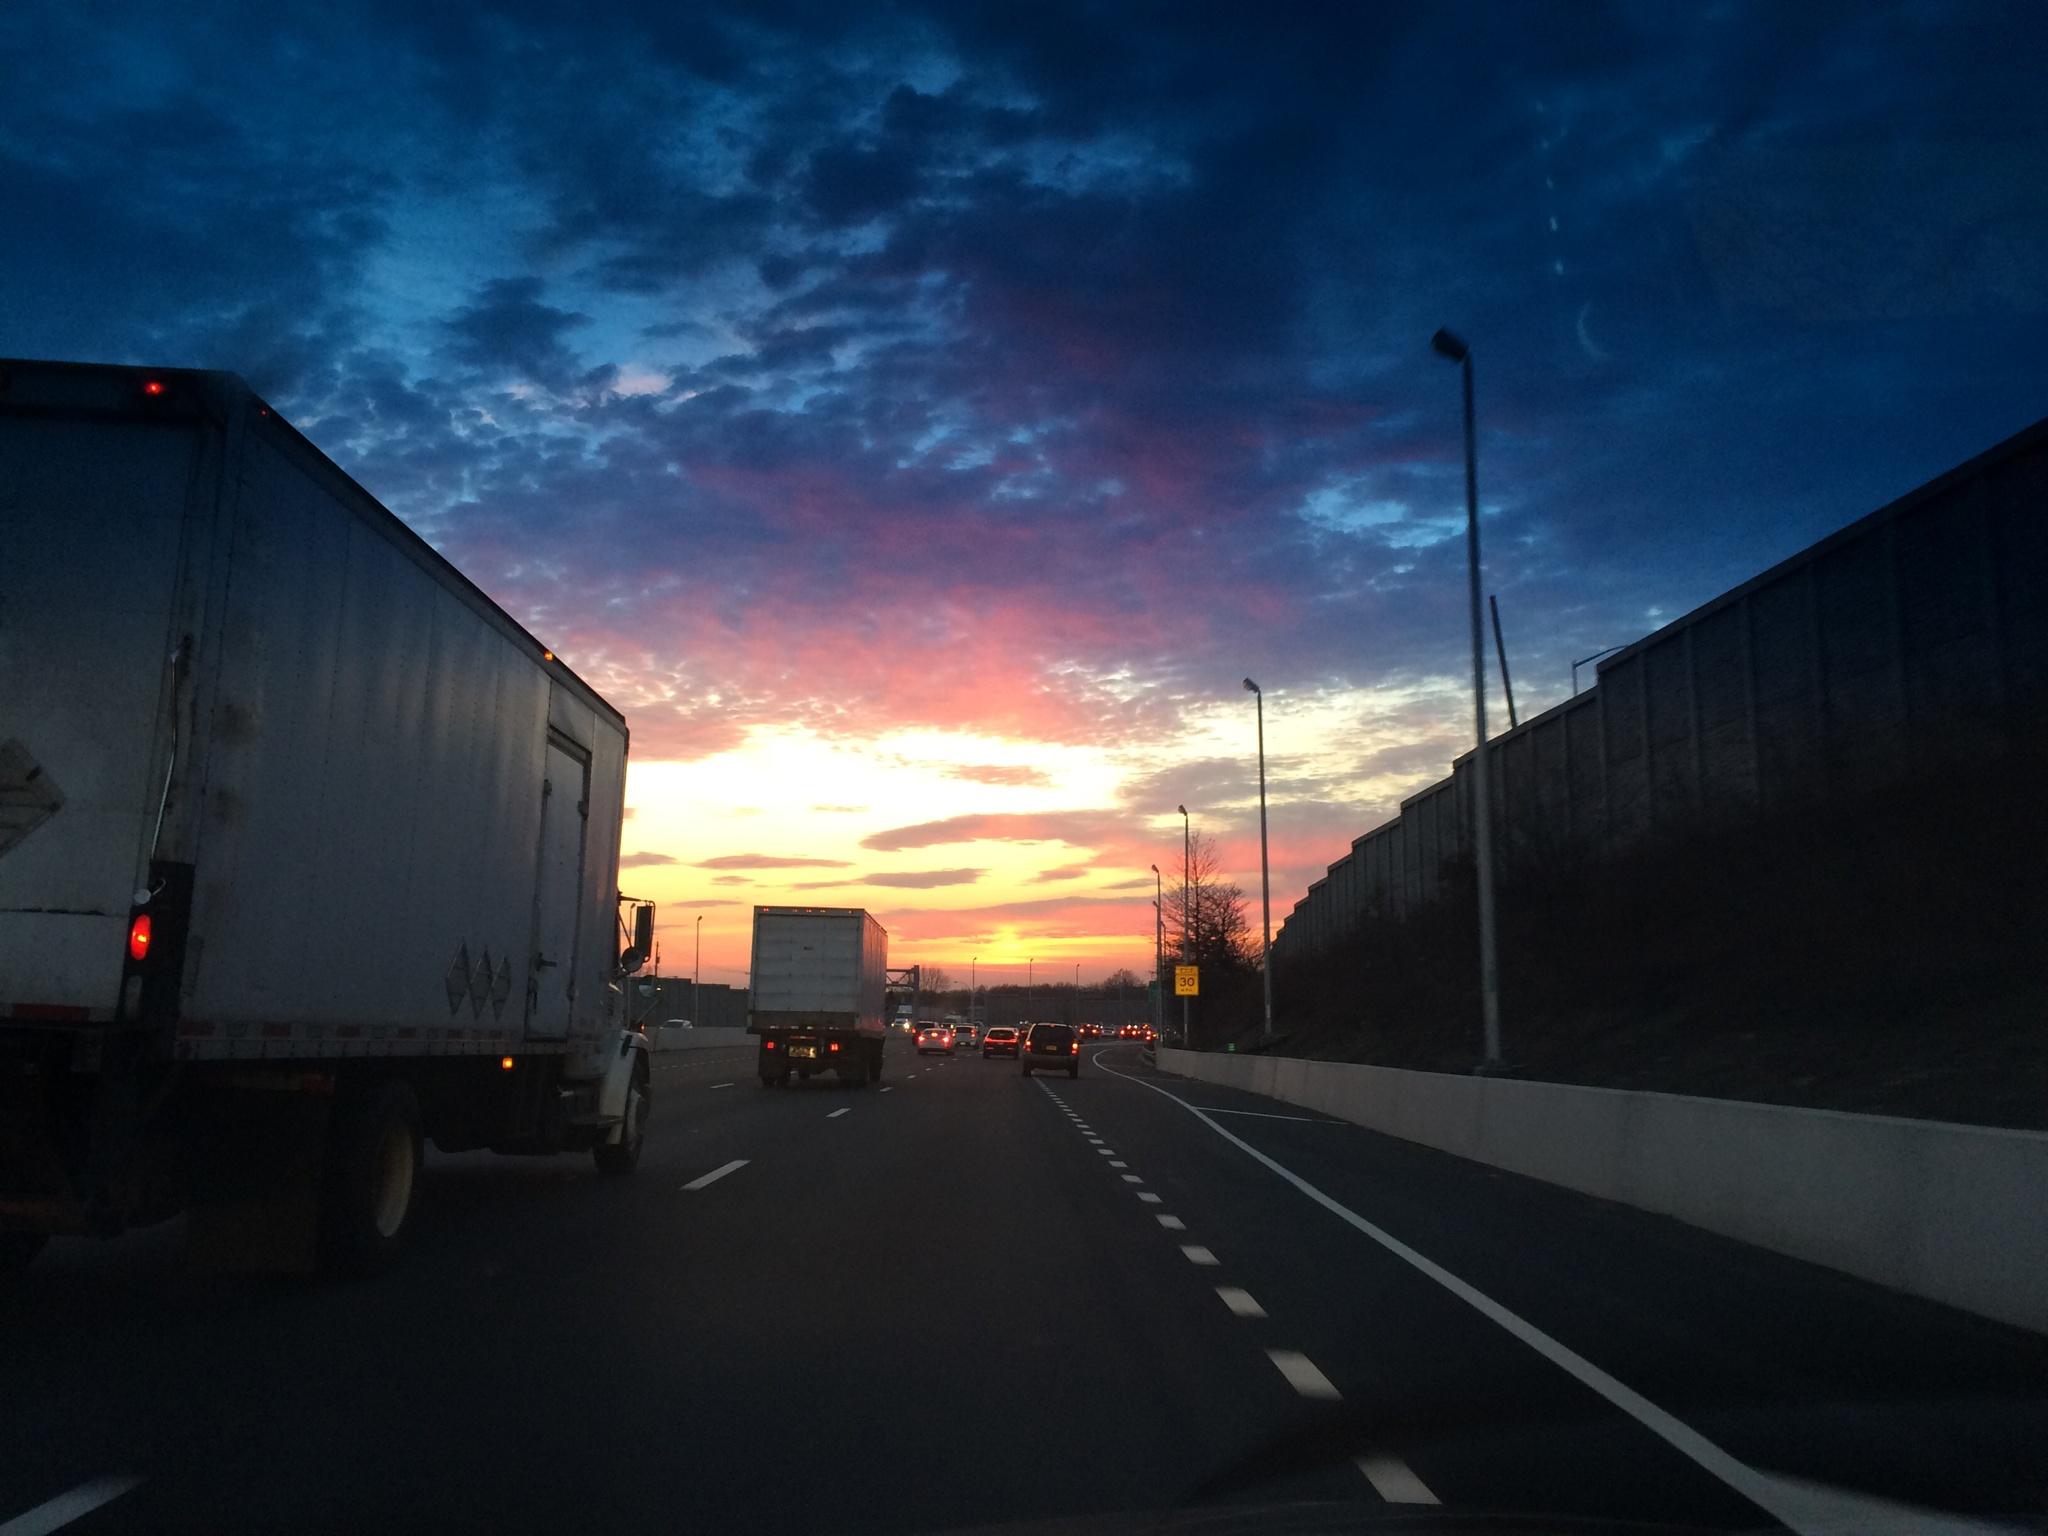 Tonight's sunset by flintfotos